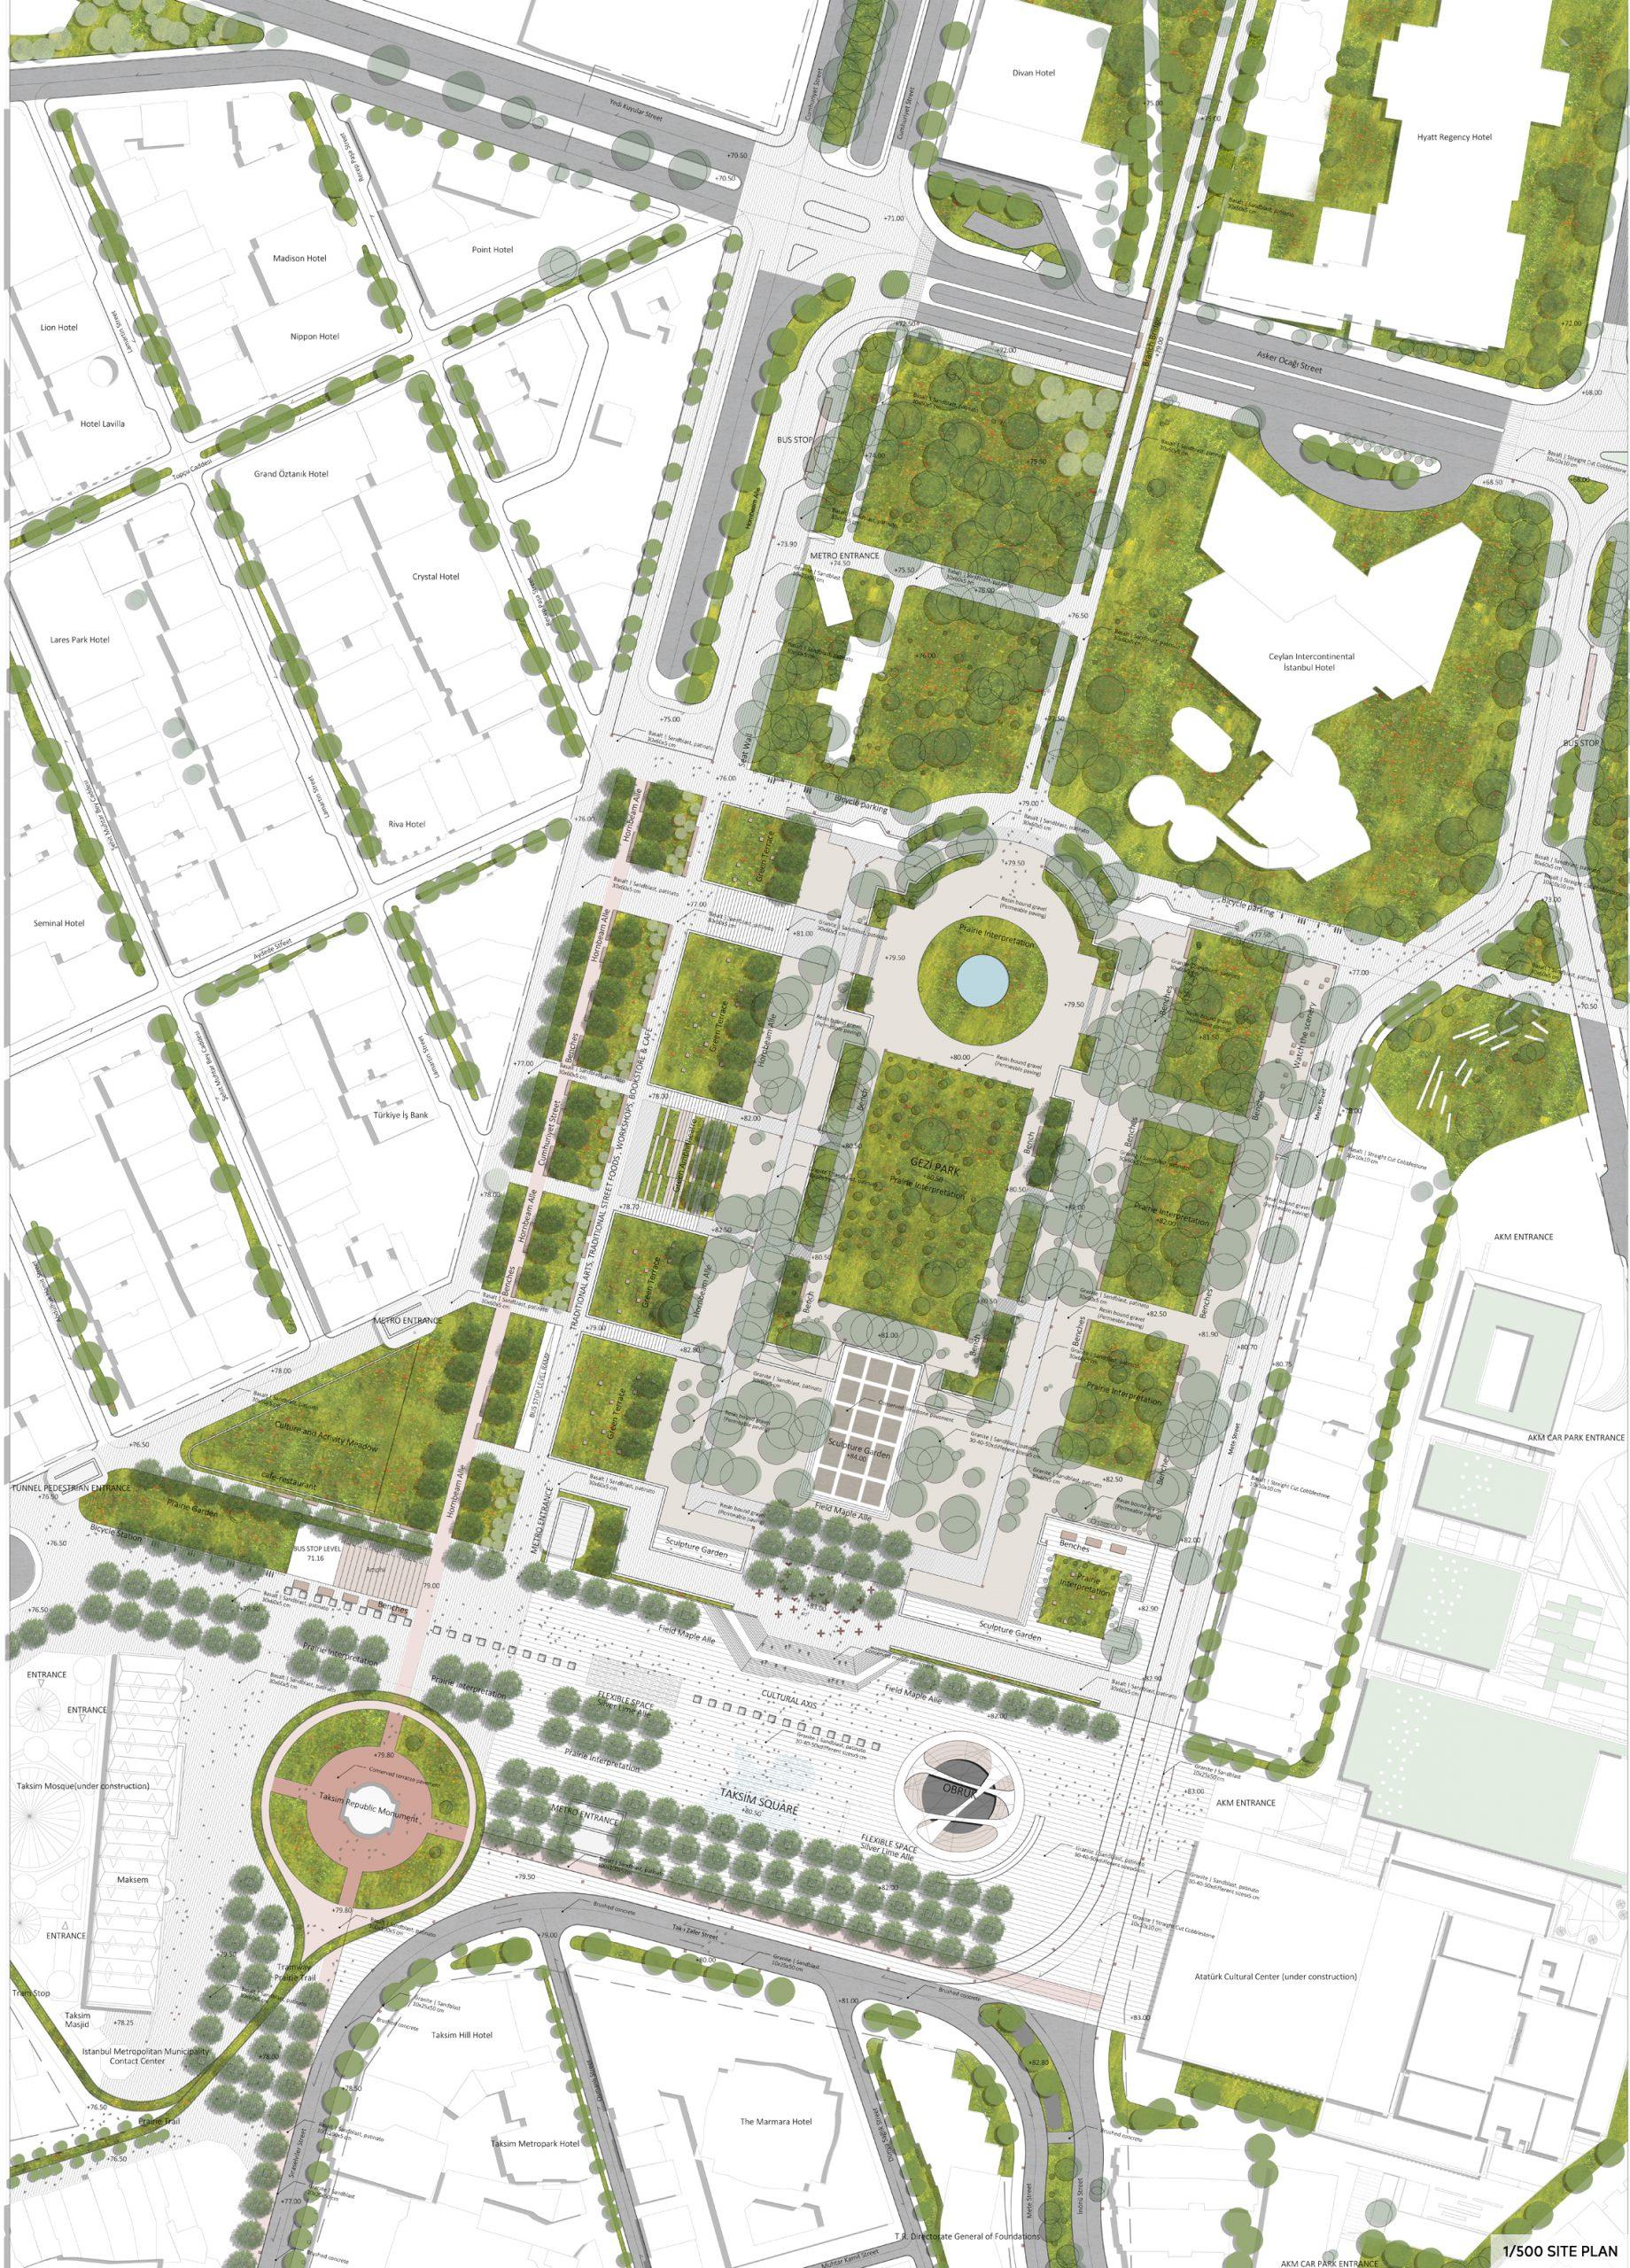 500-site plan